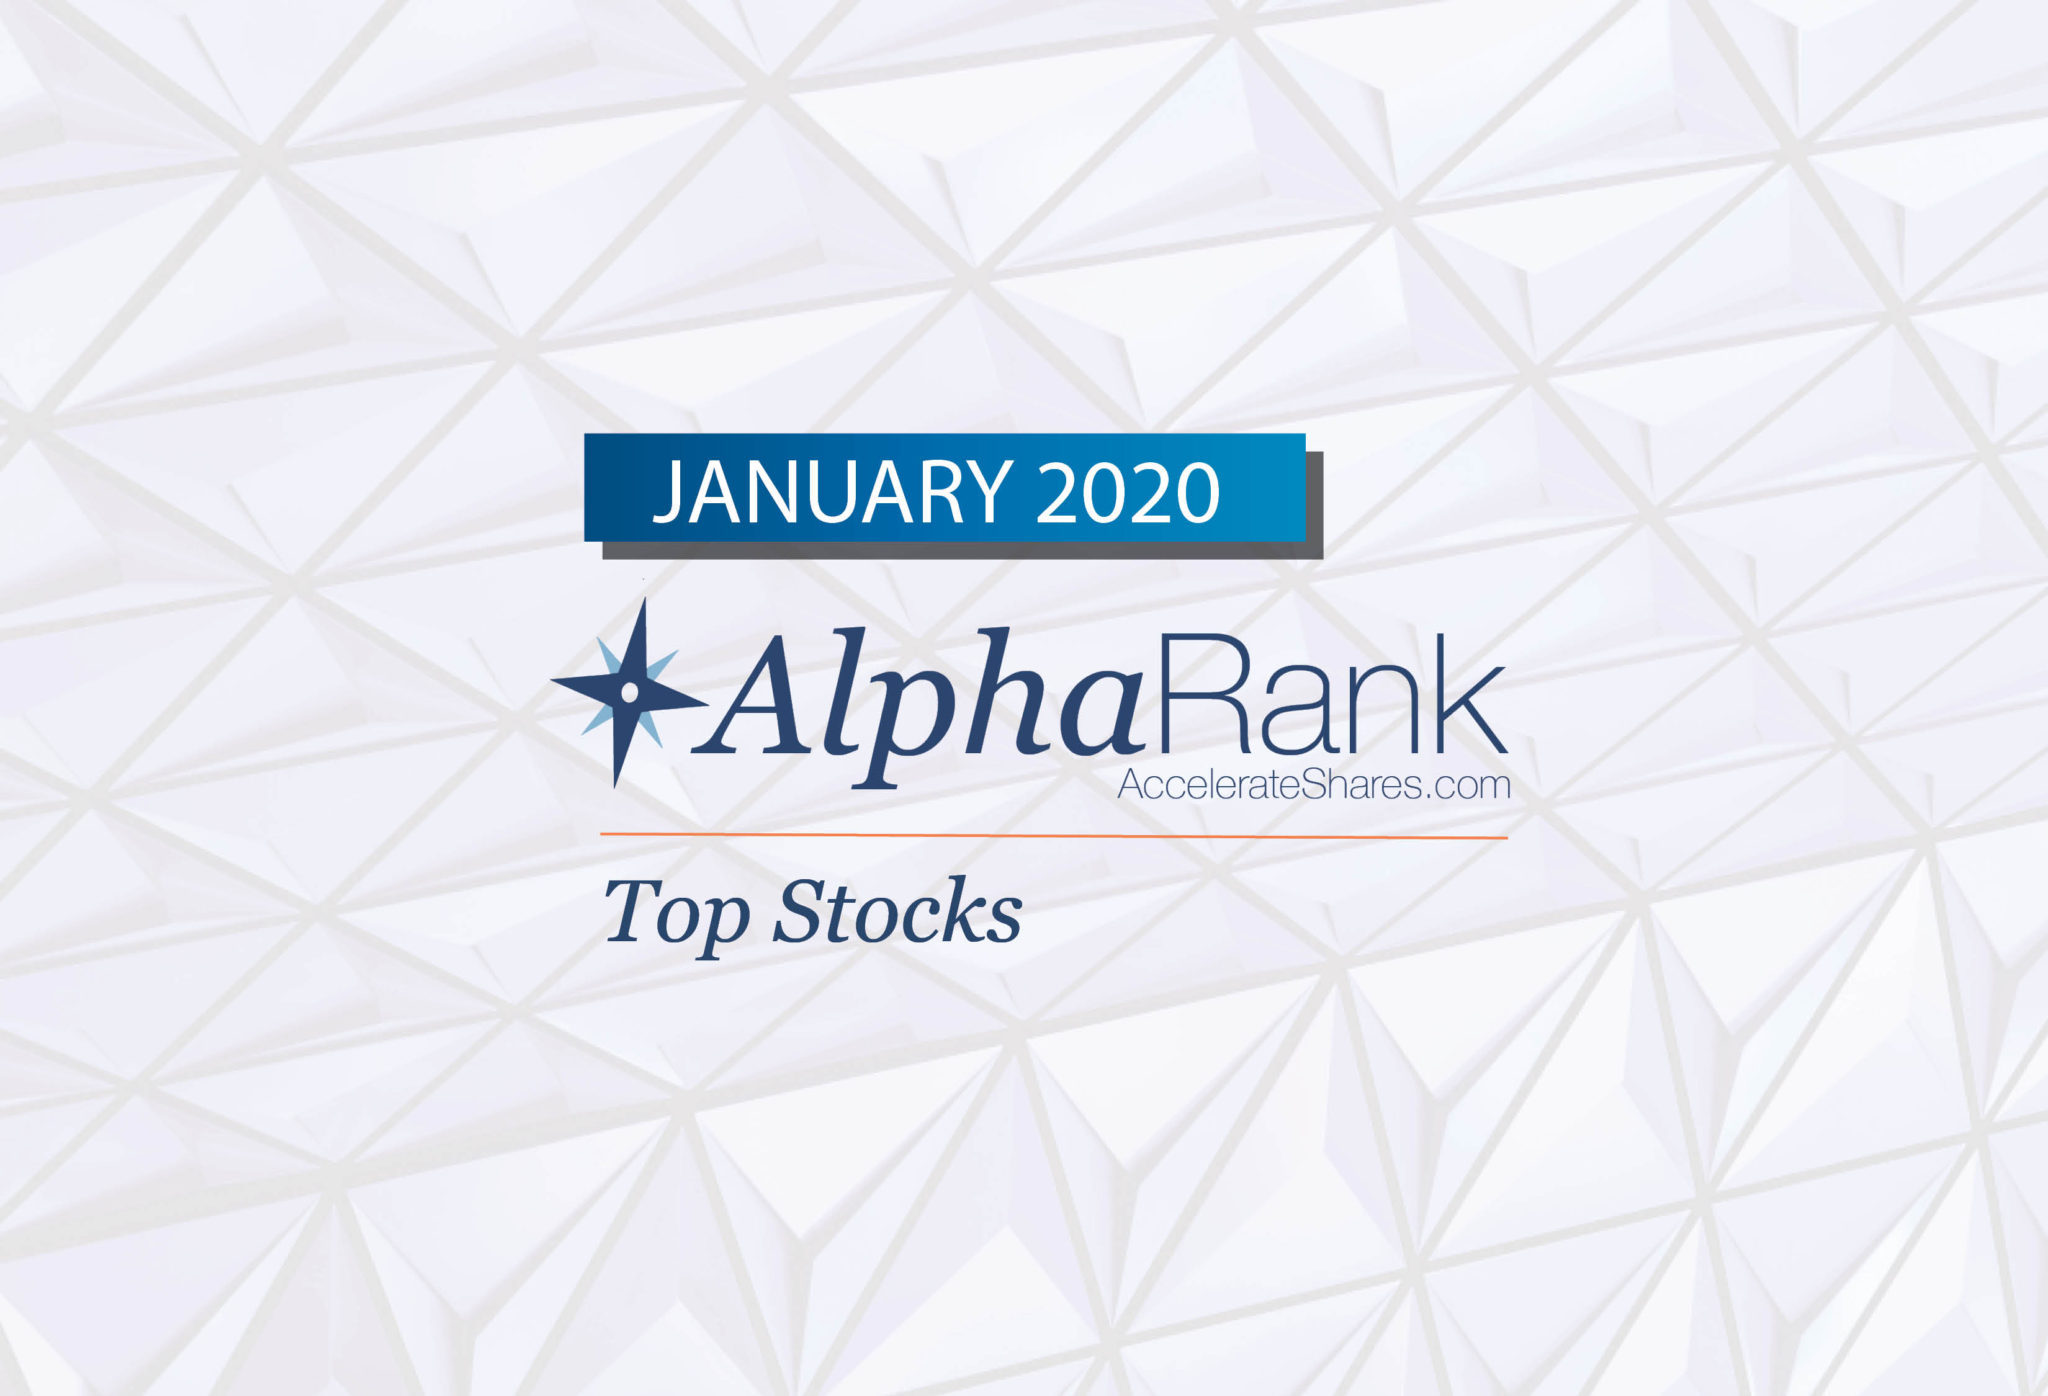 AlphaRank Top Stocks—January 2020